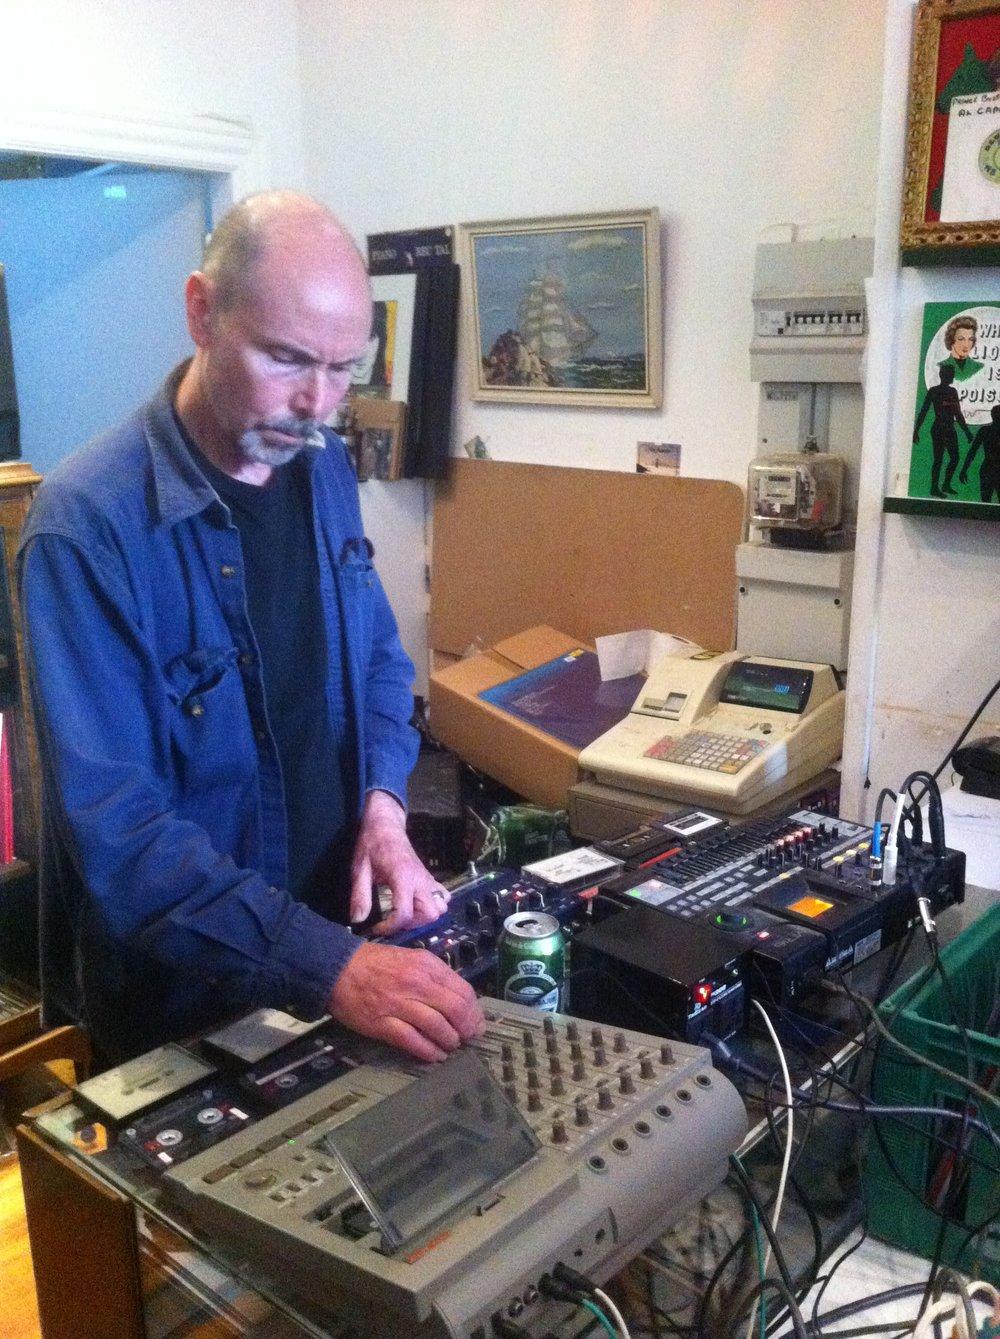 Robert Turman at Insula Music Copenhagen 2014